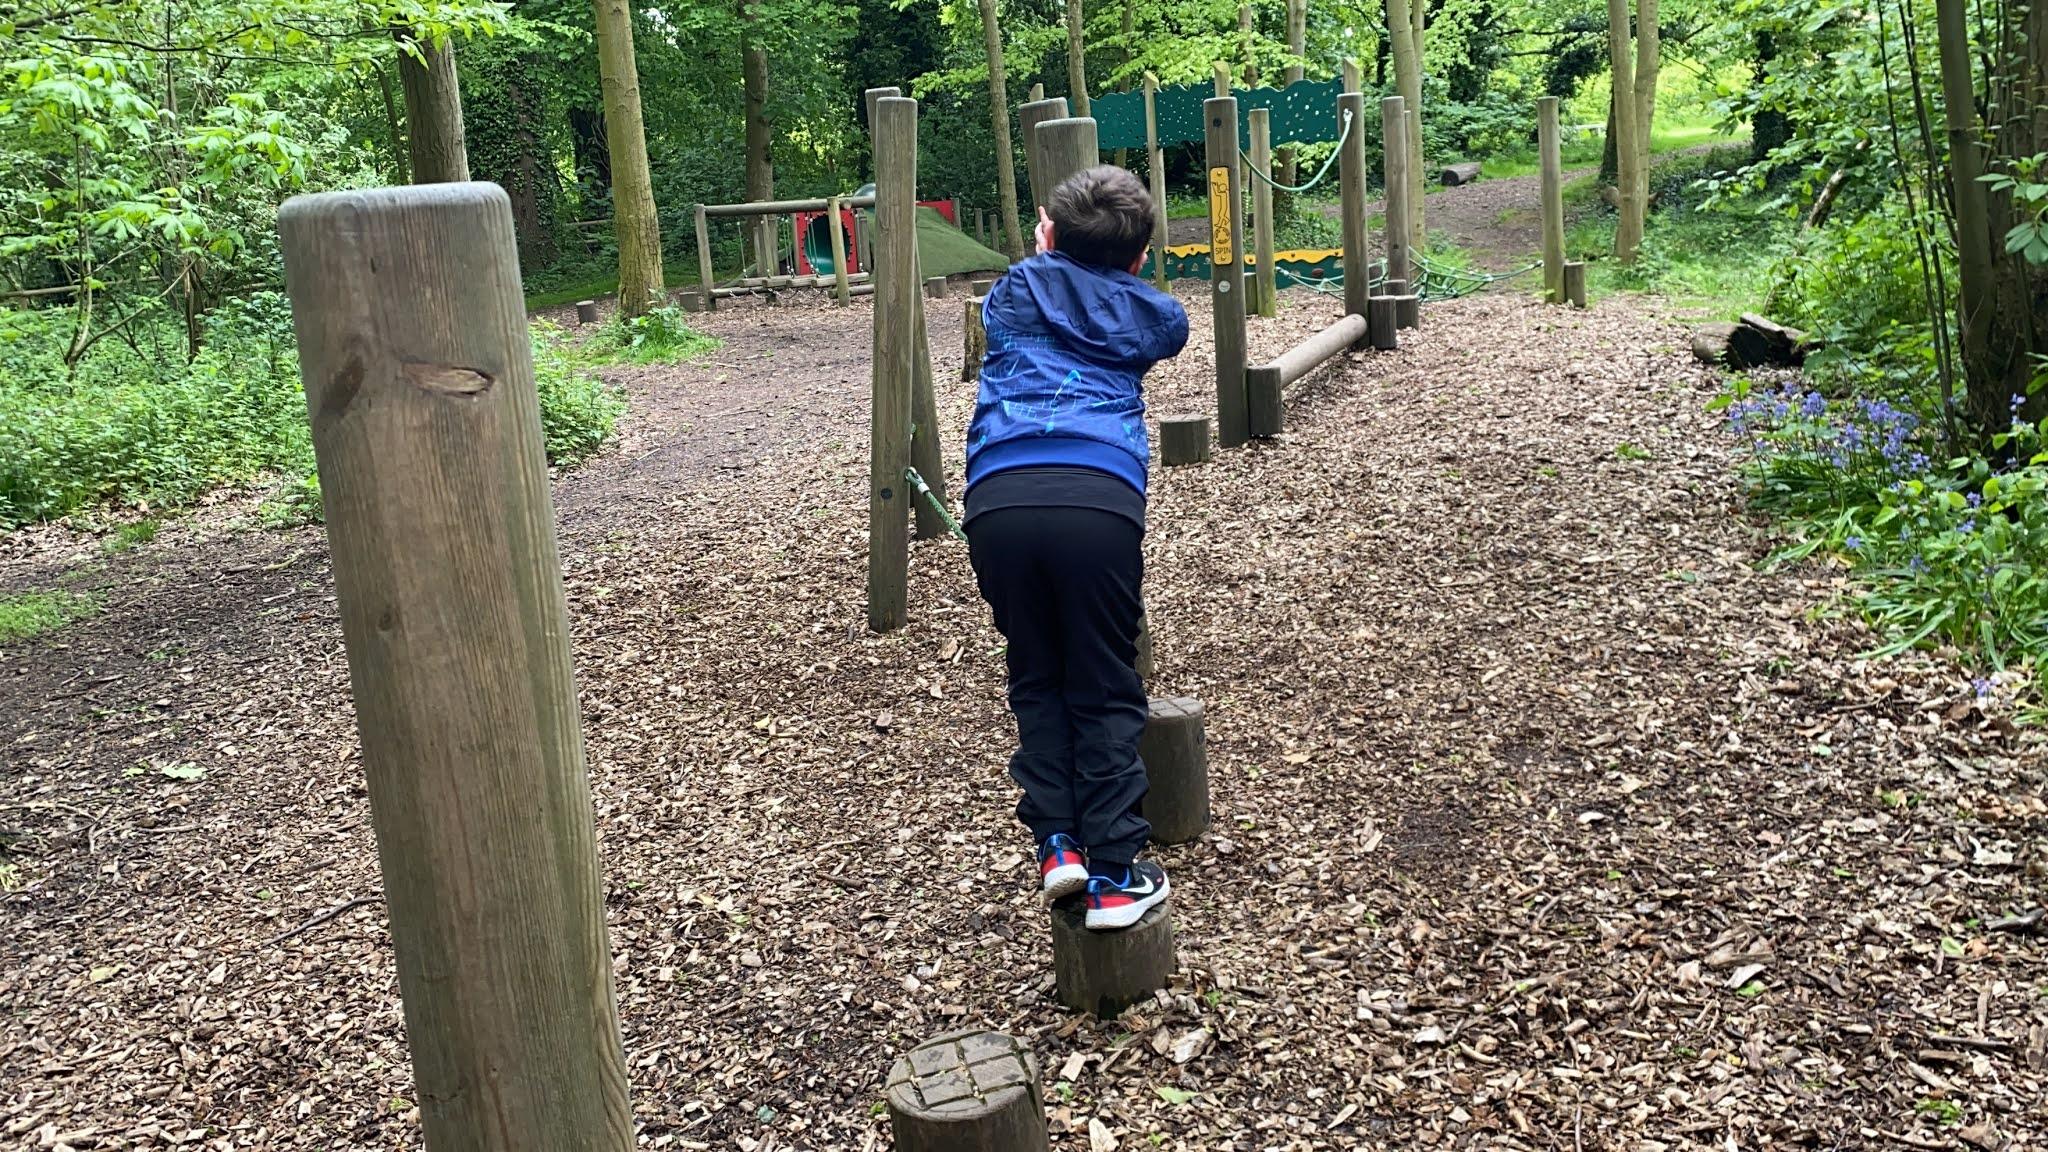 boy playing at a woodland playground